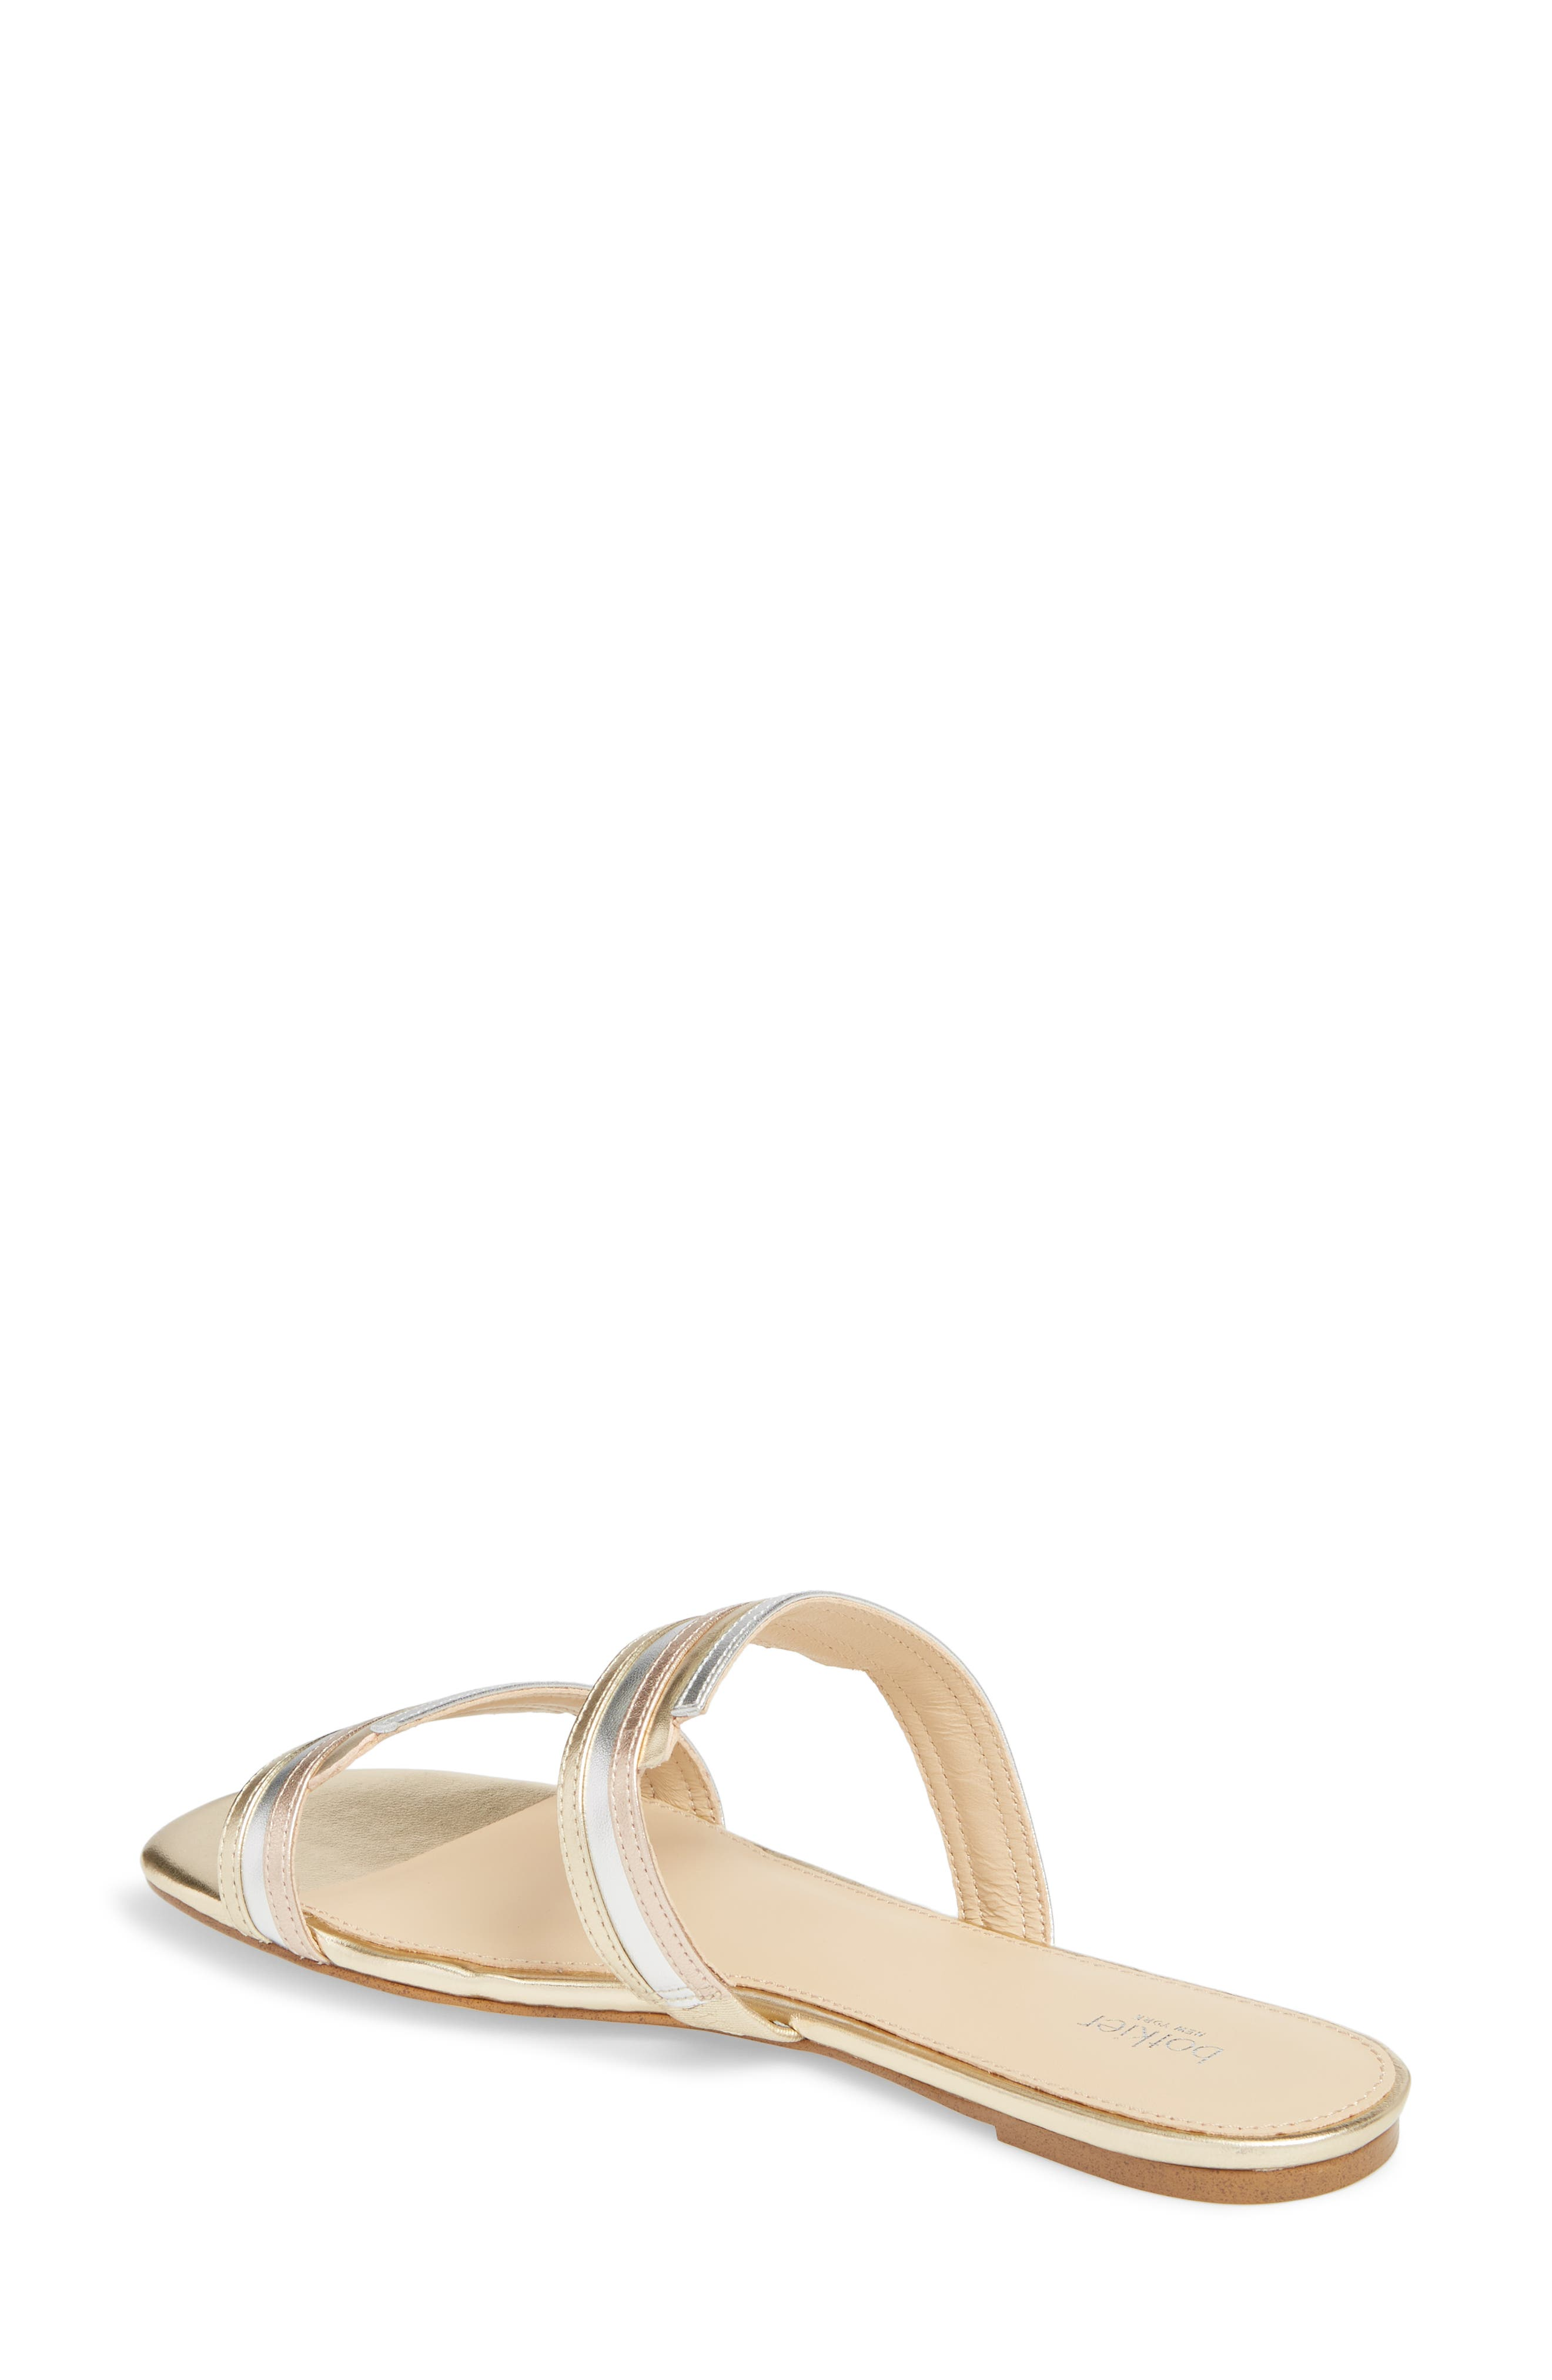 Maise Slide Sandal,                             Alternate thumbnail 2, color,                             Ivory Multi Leather